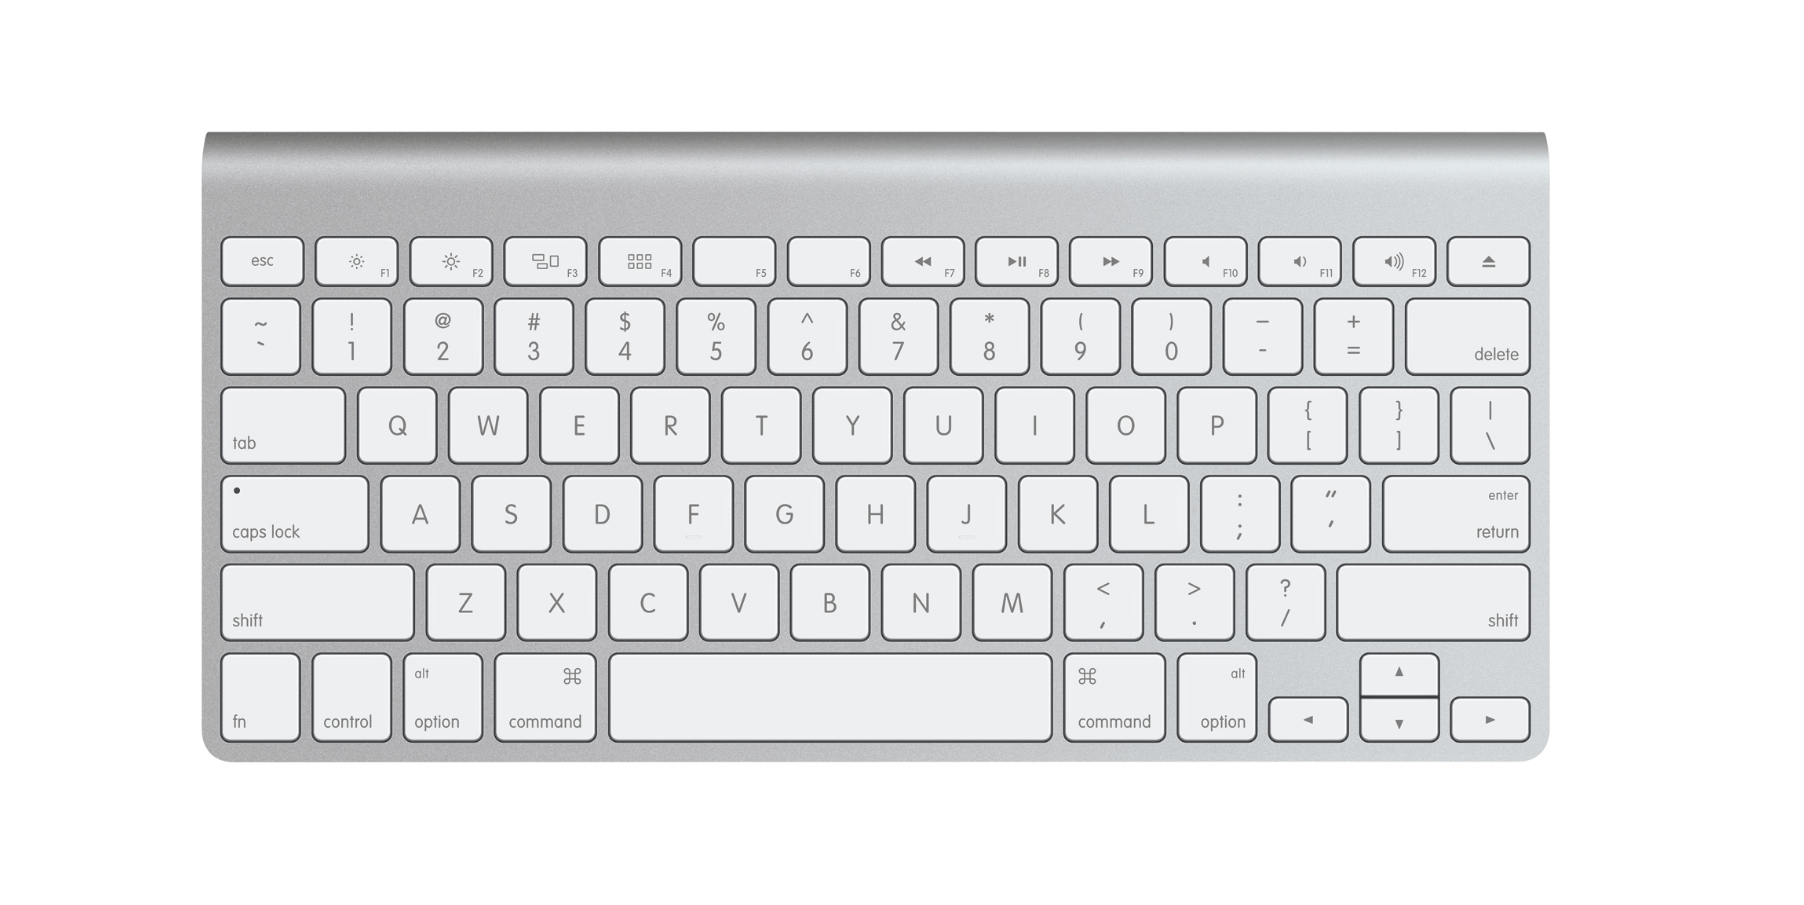 github m mono apple wireless keyboard windows driver the apple wireless keyboard drives for. Black Bedroom Furniture Sets. Home Design Ideas